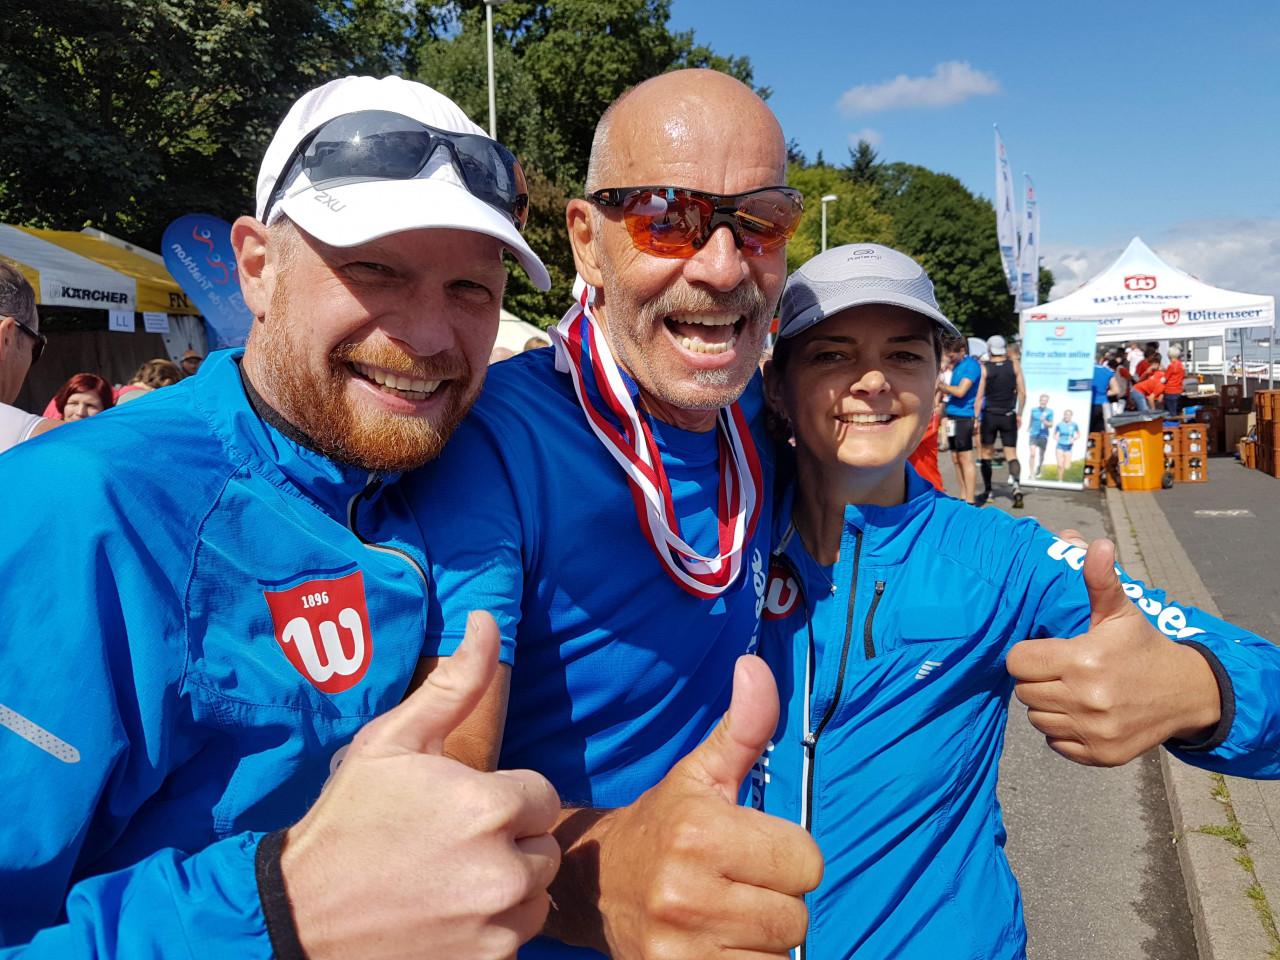 Förde Triathlon Kiel, 13.08.2017